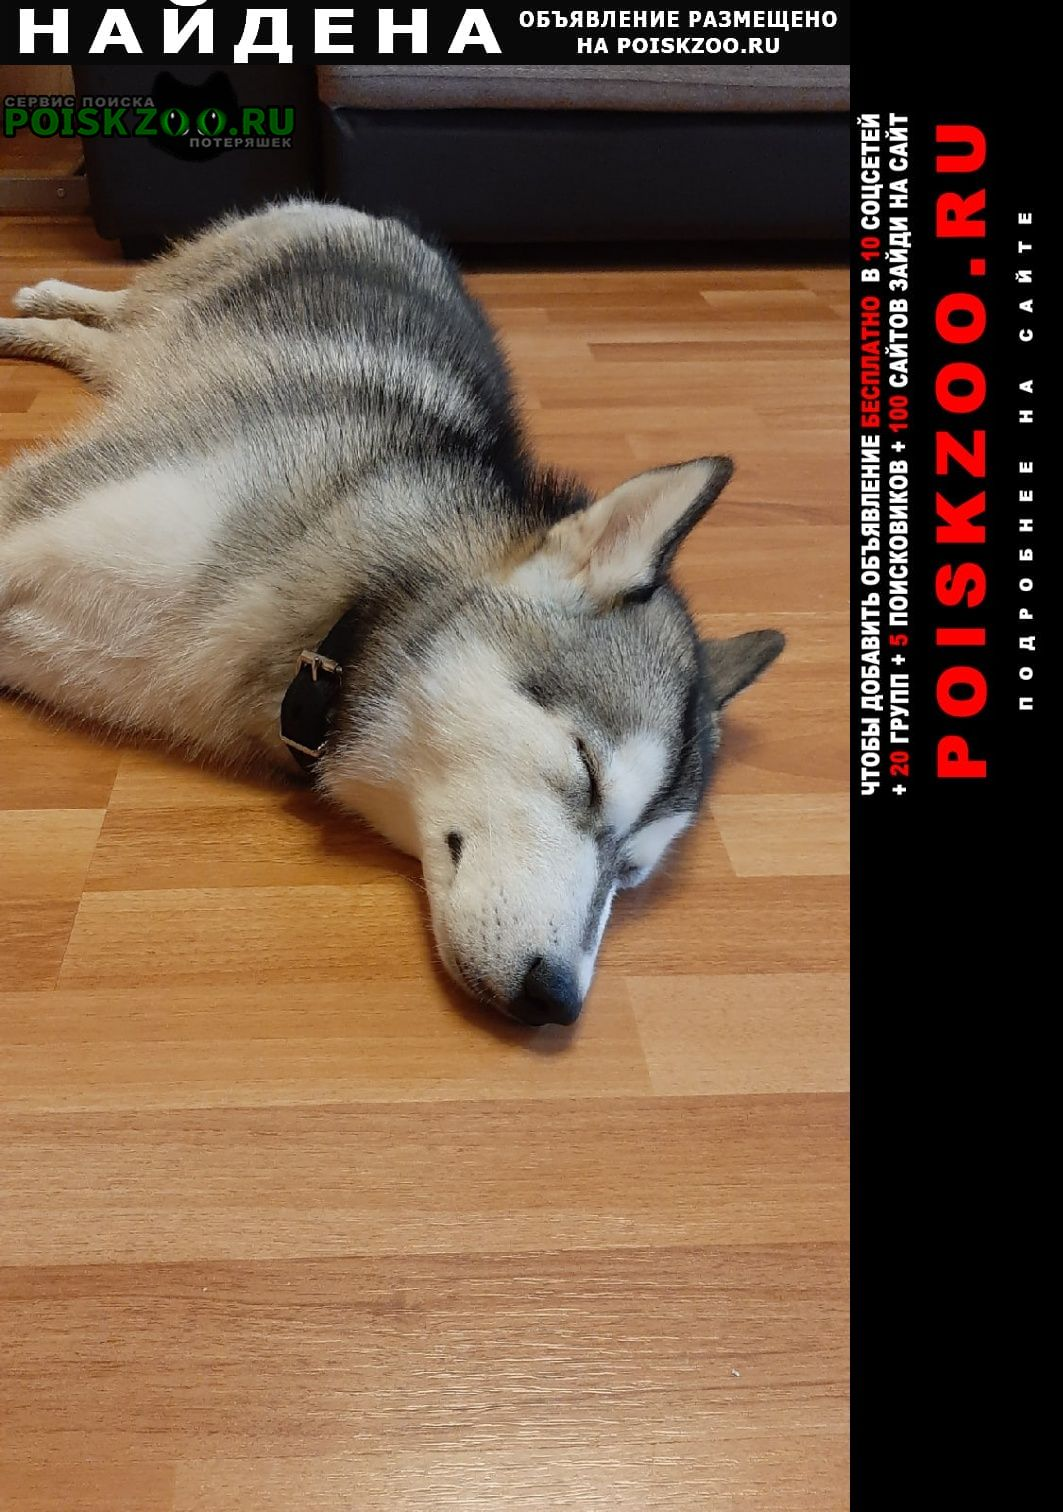 Санкт-Петербург Найдена собака щенок хаски